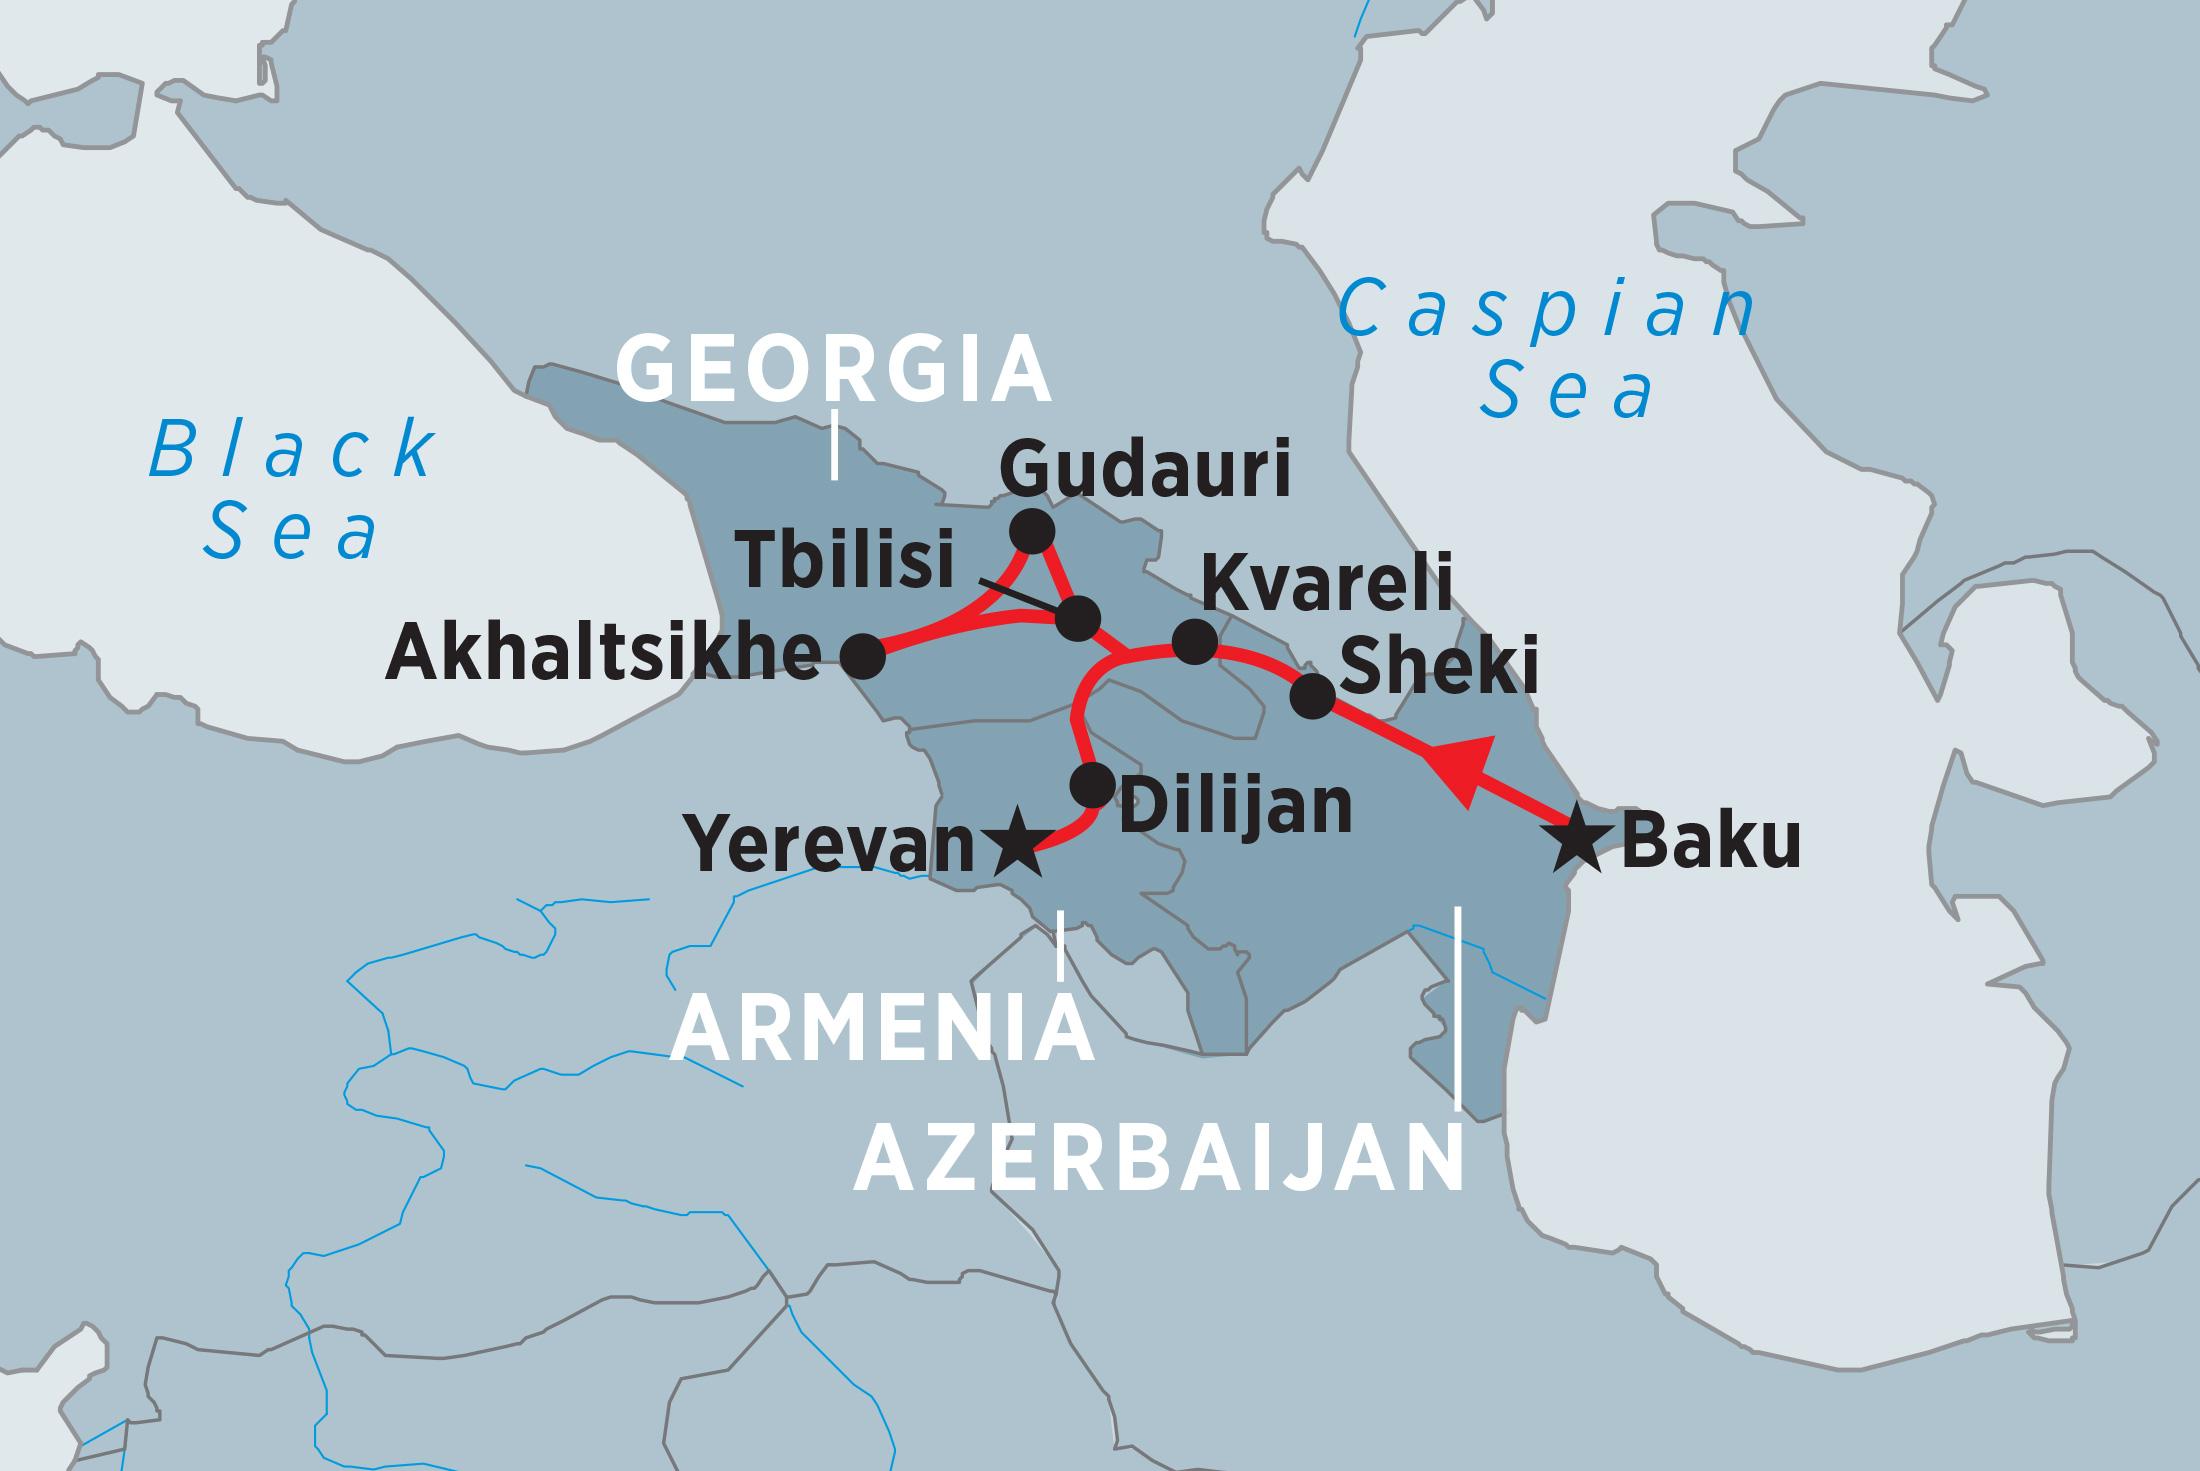 Explore Azerbaijan, Georgia & Armenia